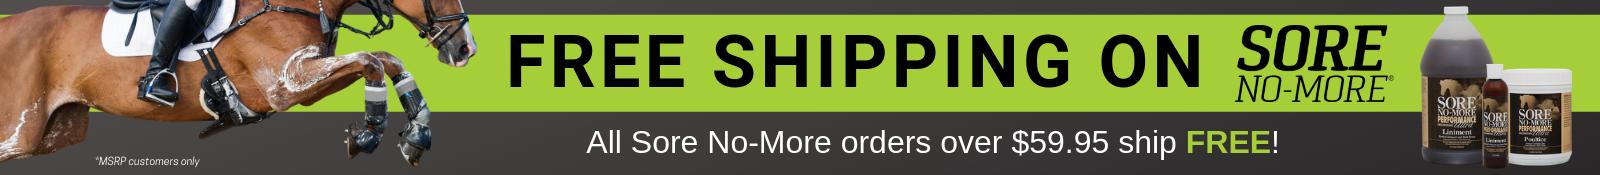 FREE Shipping on Sore No-More!